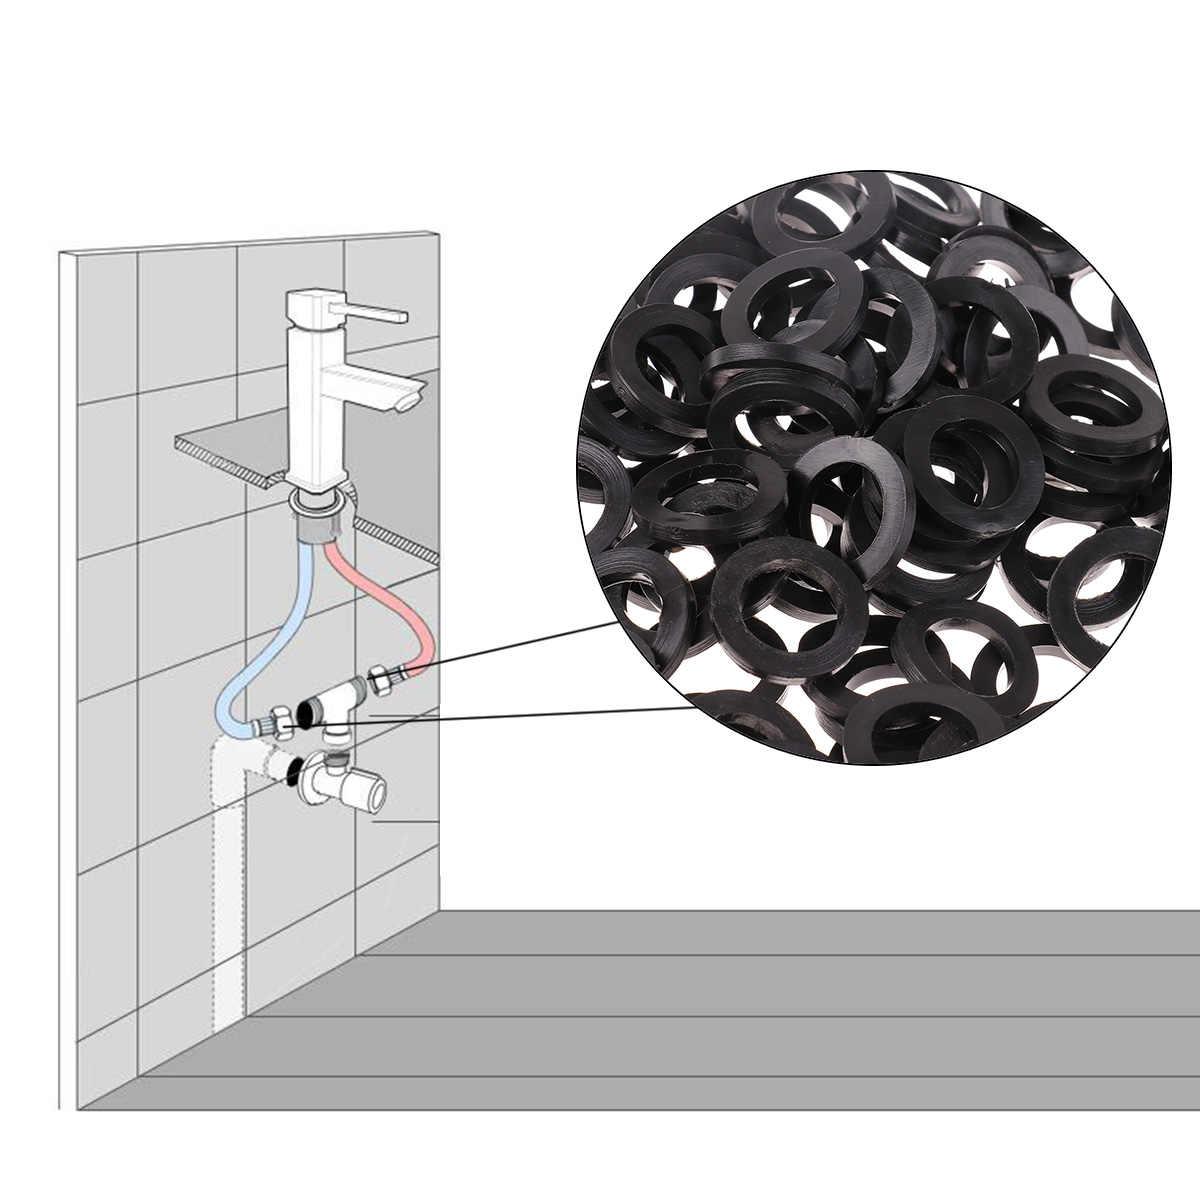 Black 100 pcs Sealing Flat Gasket Rubber Silicone O Ring Seal Washer Bellows Hose Half Inch